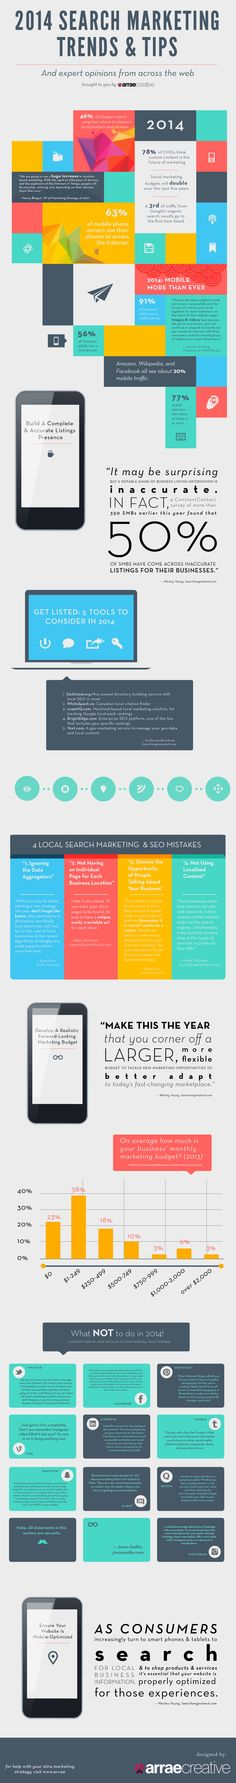 SEM Trends 2014-Infographic